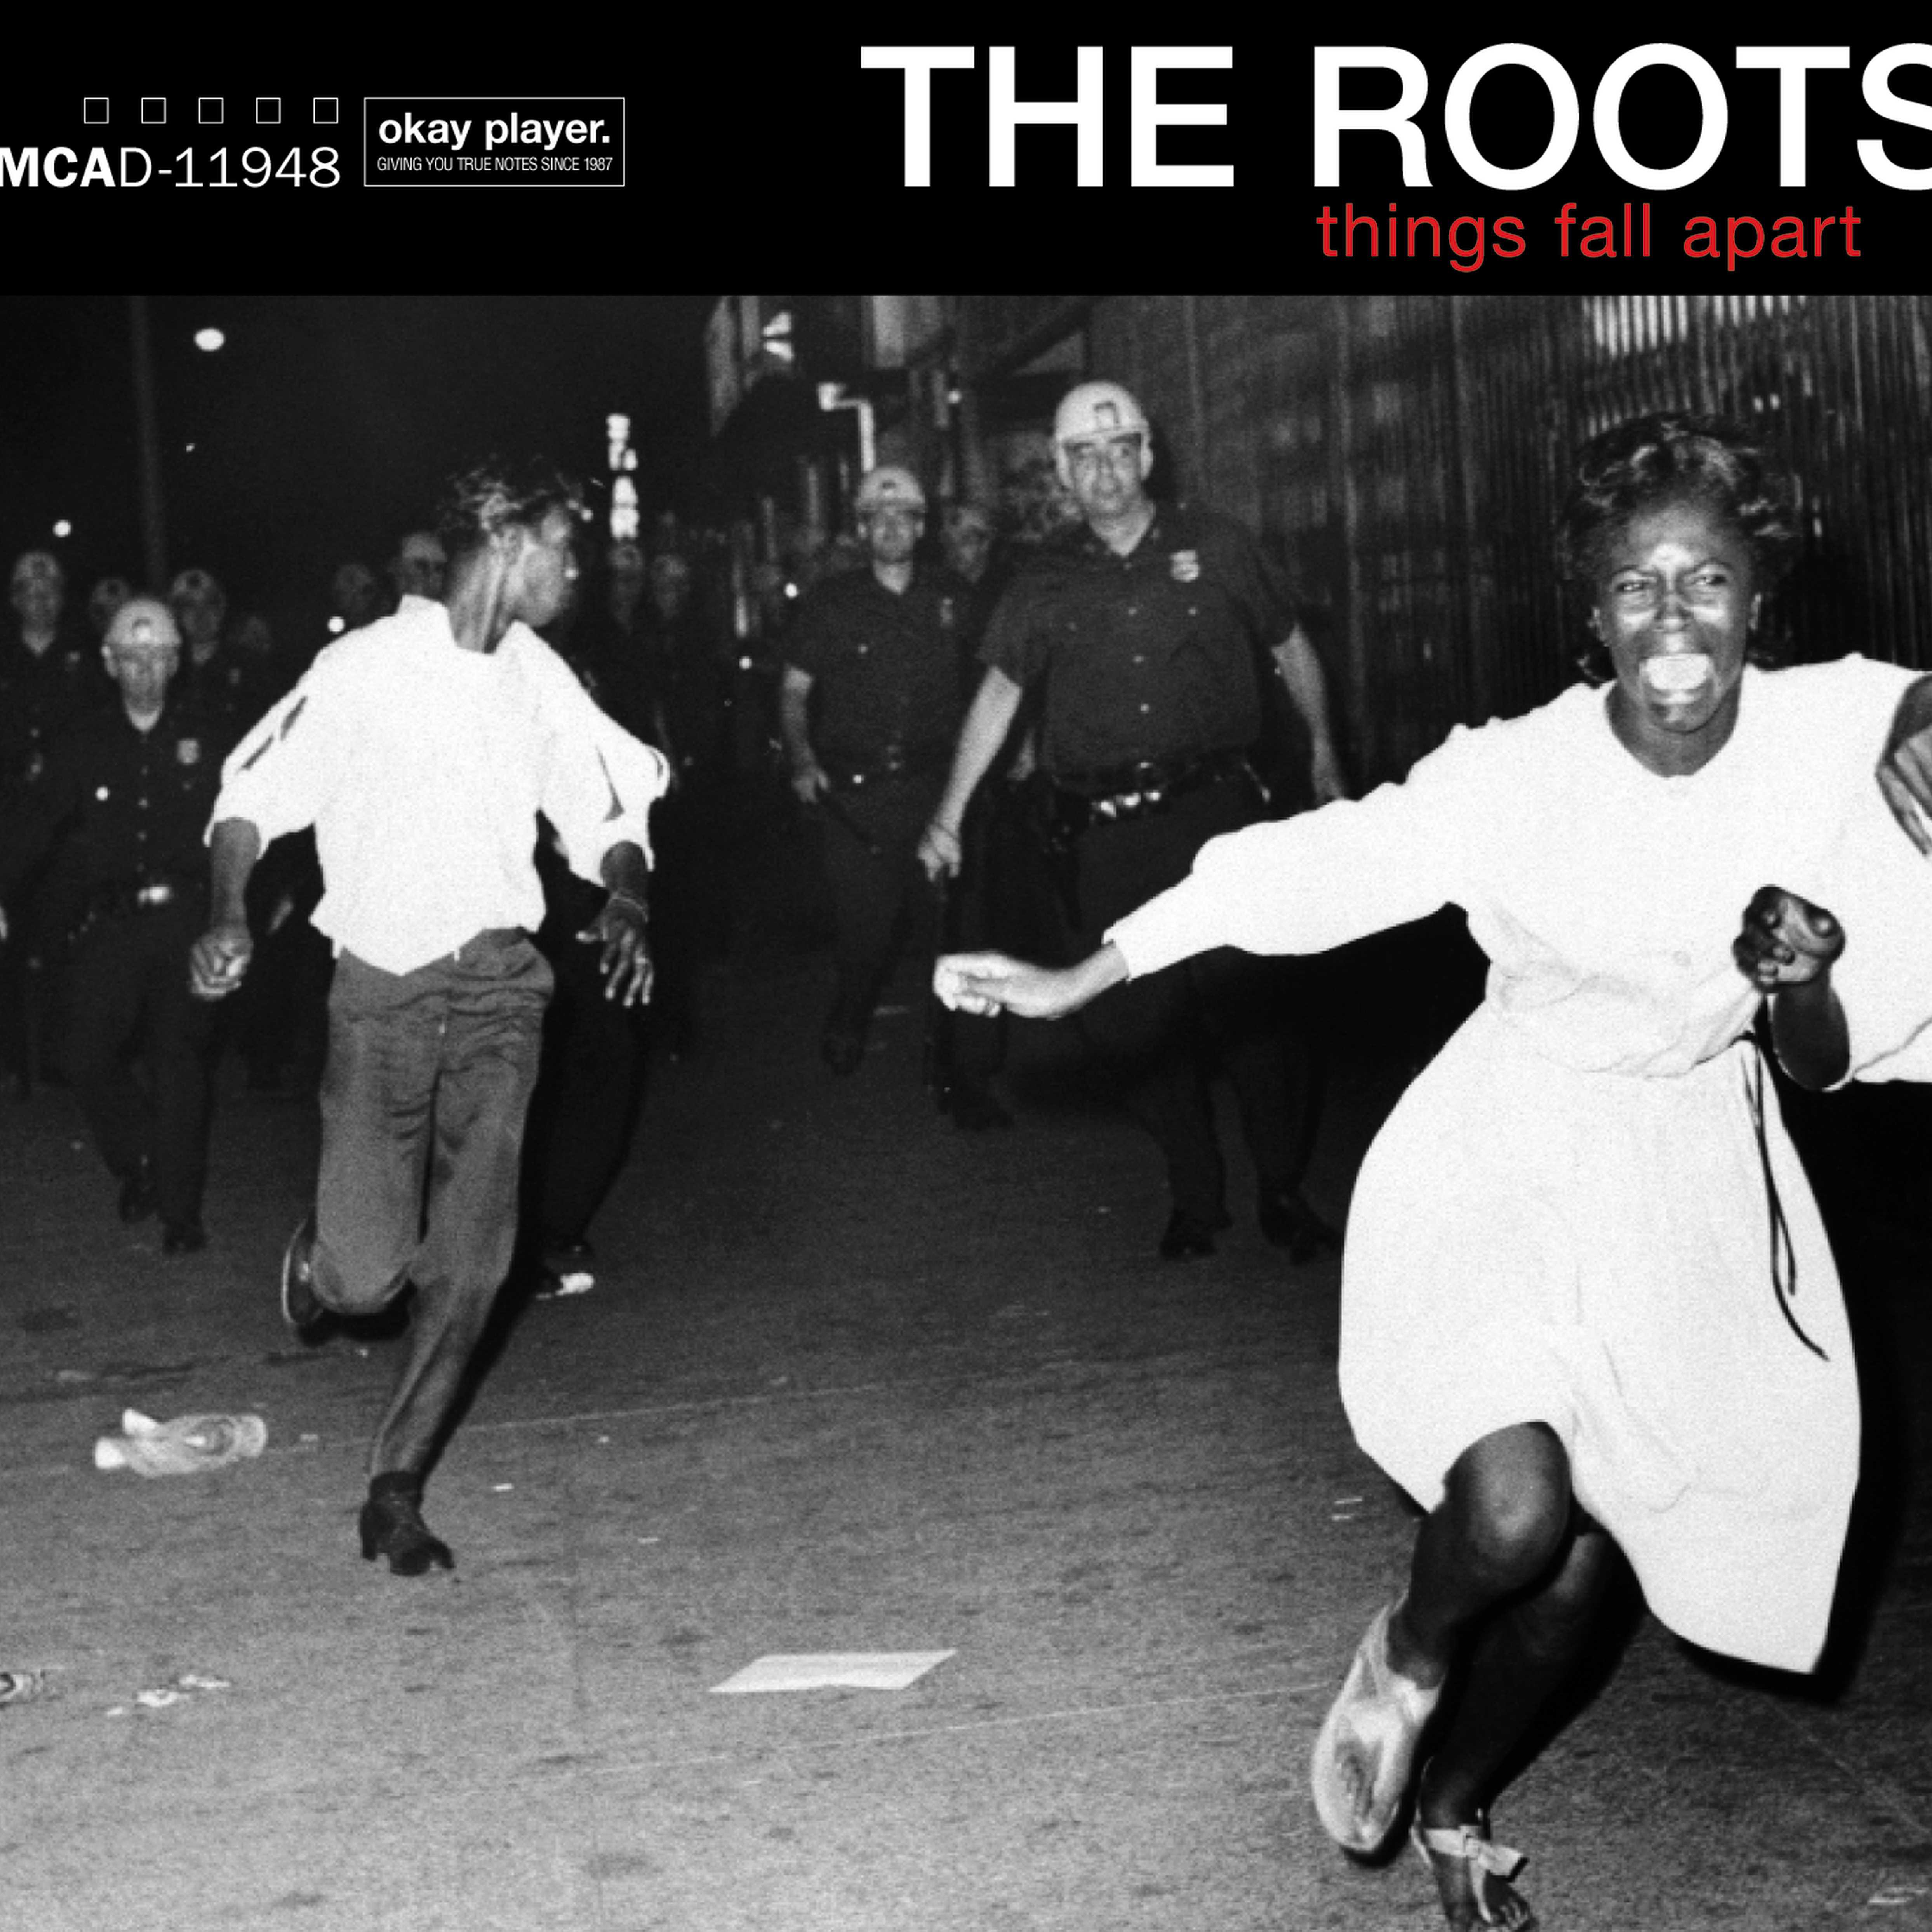 Buy Online The Roots - Things Fall Apart Deluxe Triple Vinyl